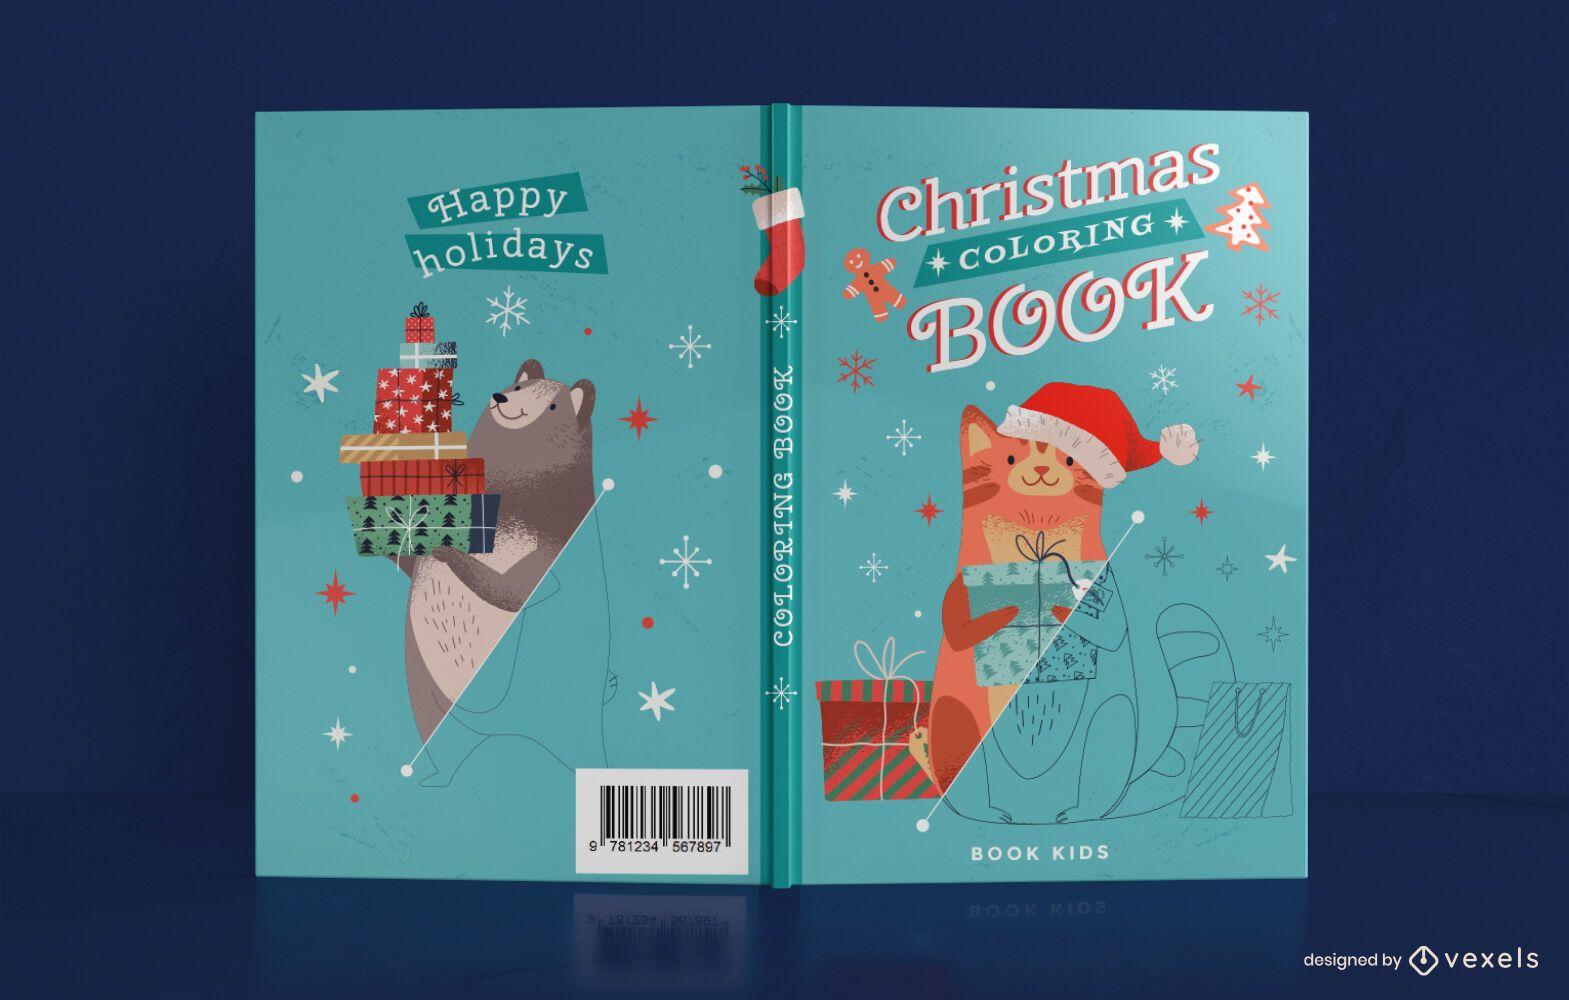 Lindo dise?o de portada de libro para colorear de navidad